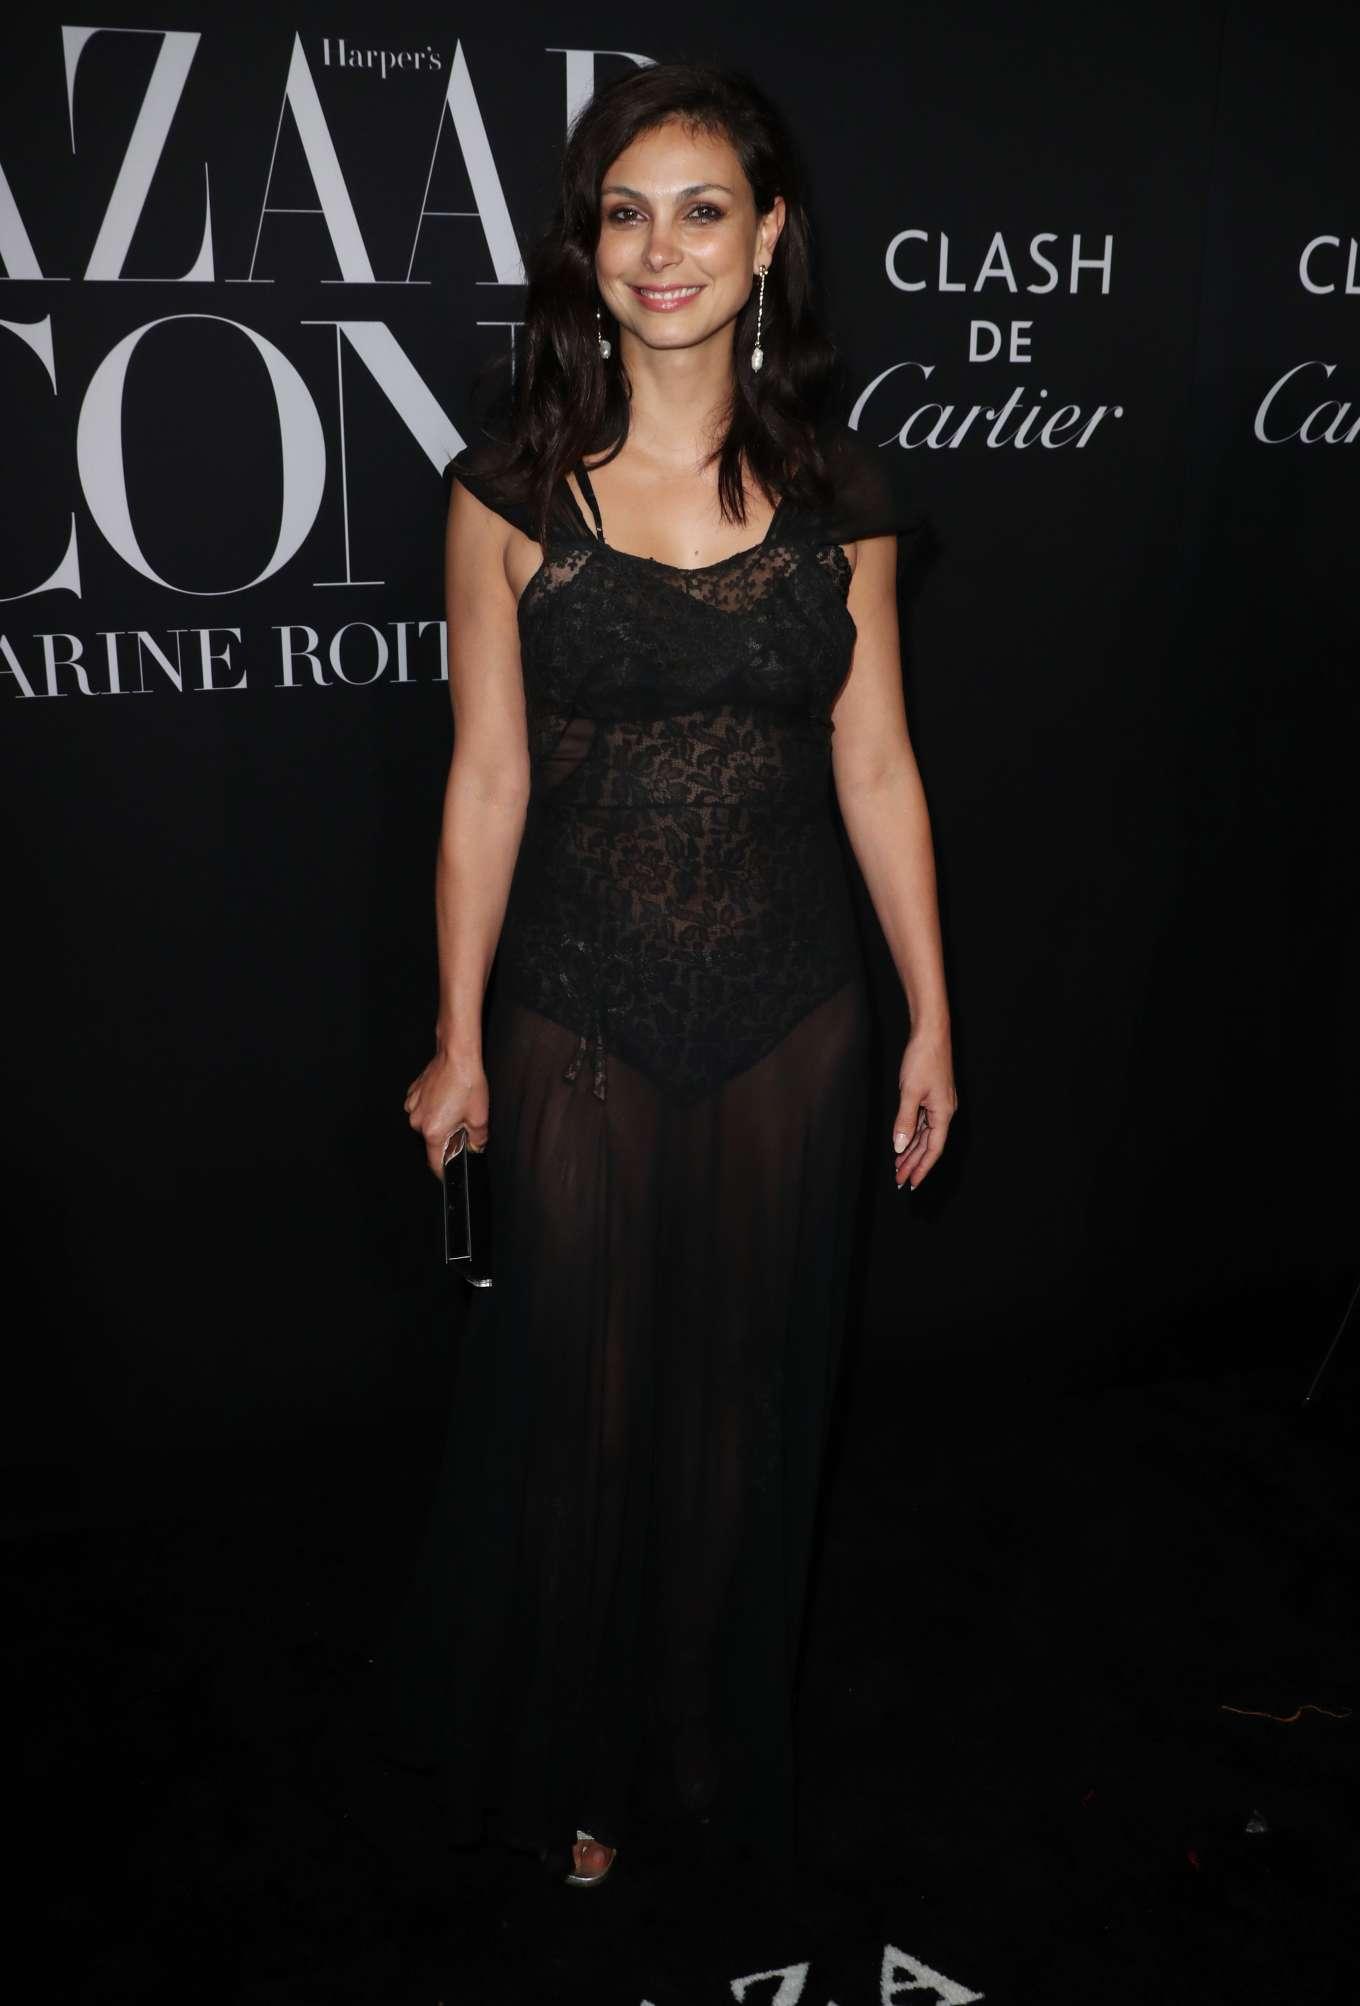 Morena Baccarin - Harper's BAZAAR Celebrates 'ICONS By Carine Roitfeld' in NYC